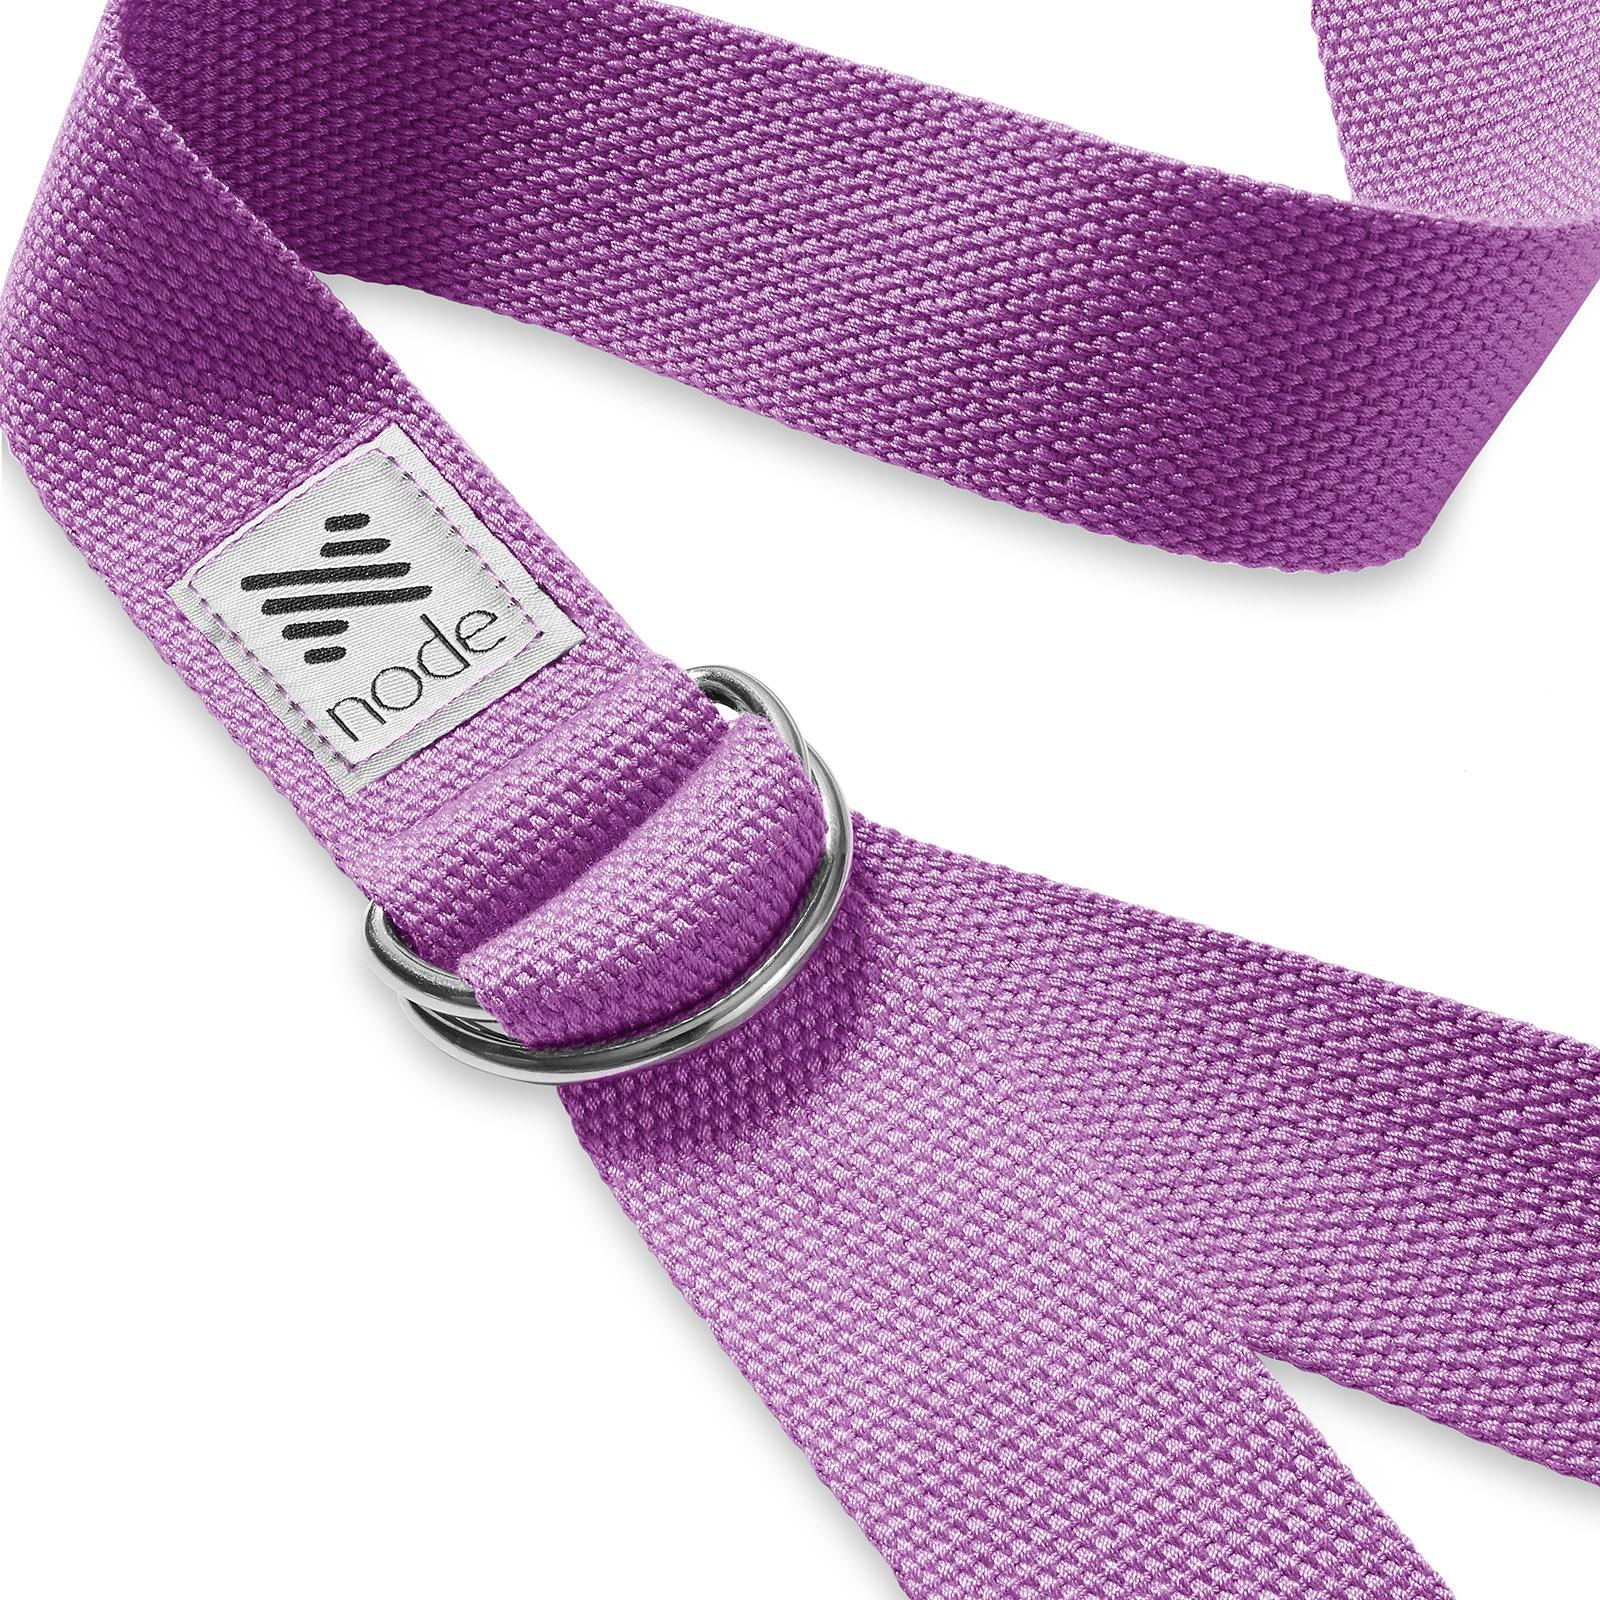 7-1-2-039-Woven-Cotton-Blend-Yoga-Strap-Stretching-Exercise-Prop-Belt thumbnail 25